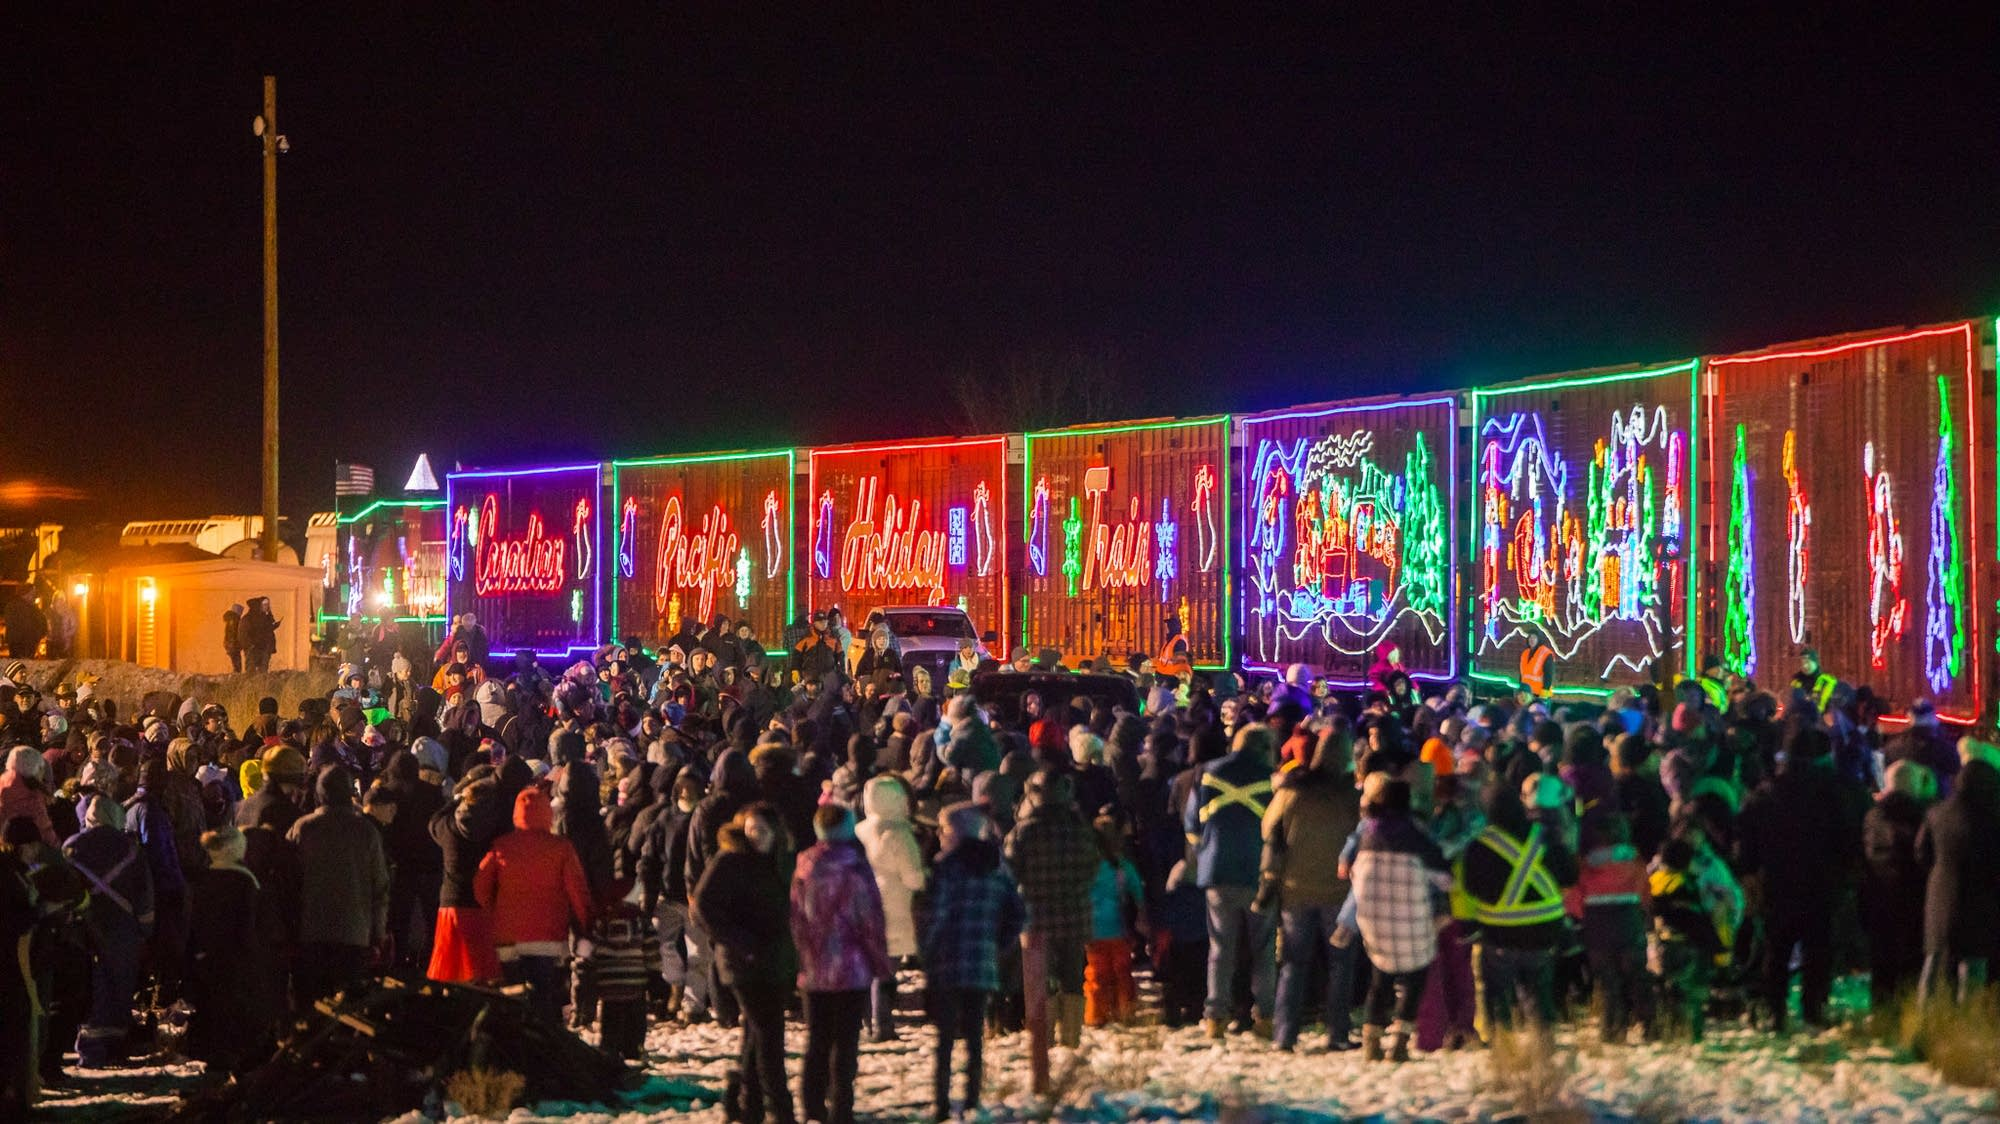 Christmas Train Schedule 2020 Calgary C Train Christmas Schedule 2020   Qtuyxz.mynewyearpro.site